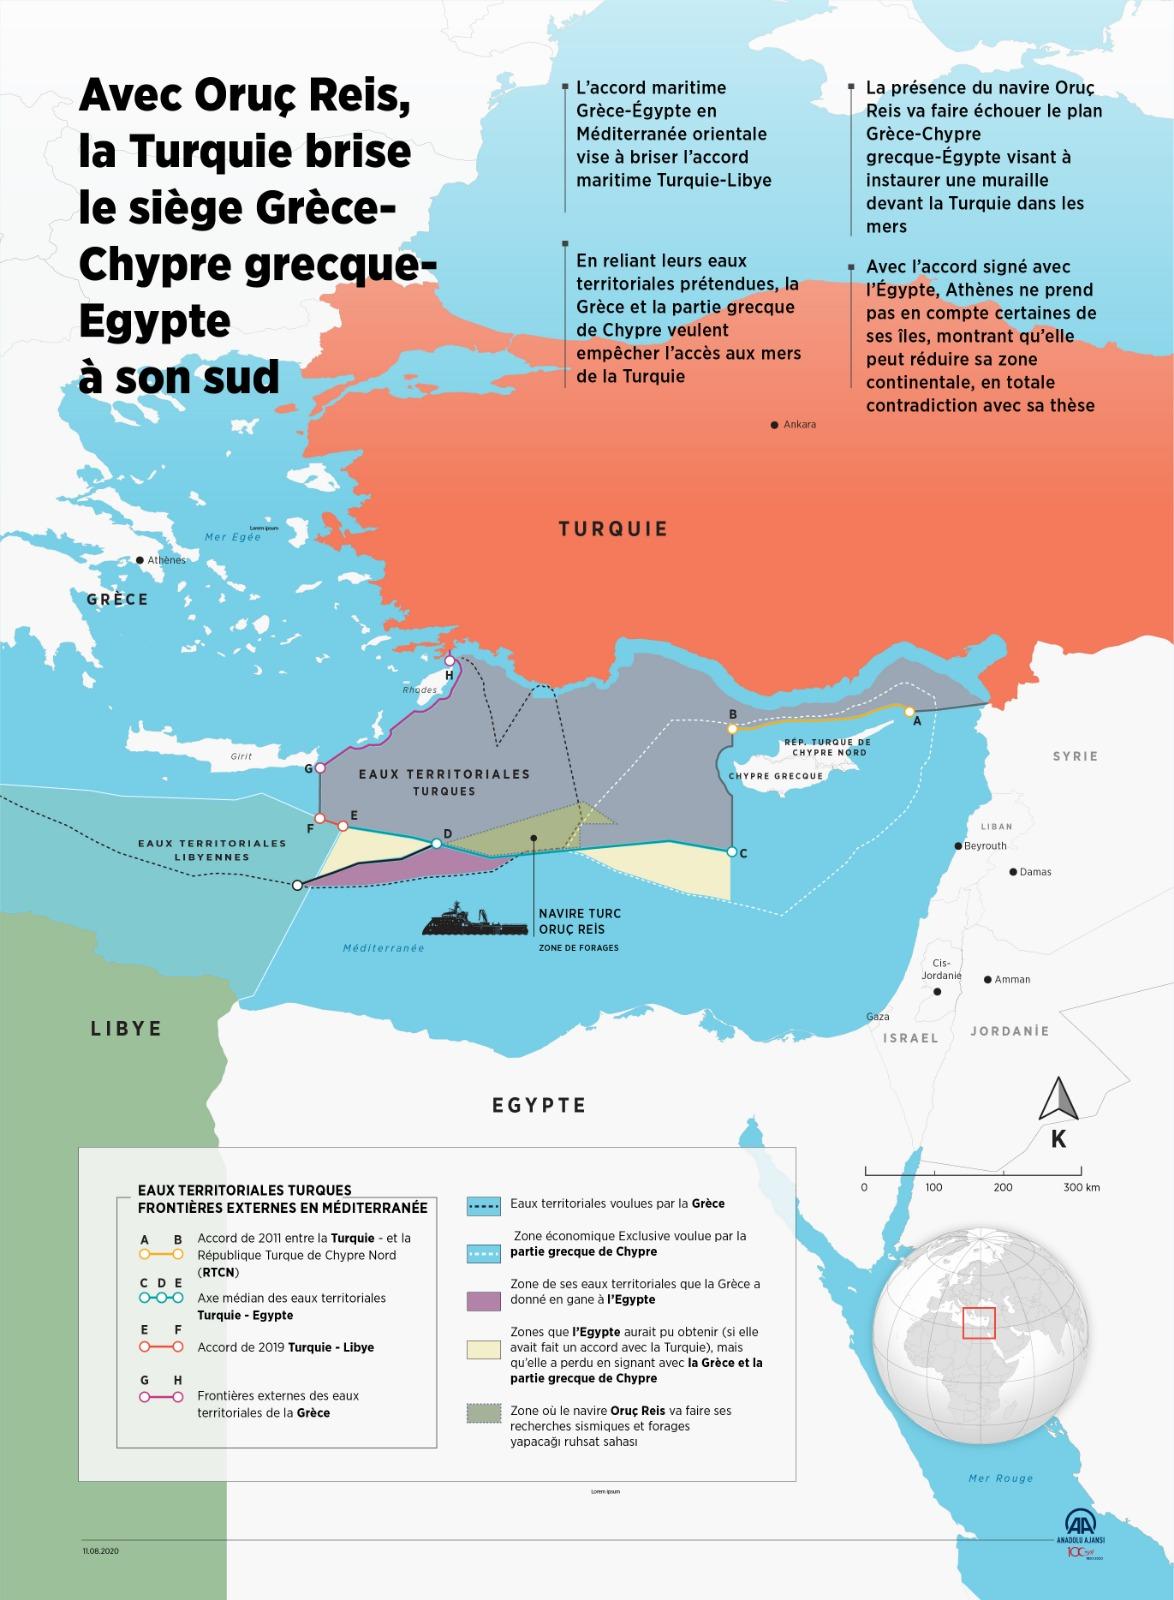 Conflit Turquie-Grèce en vue EfJGxDiWkAUsP-S?format=jpg&name=large